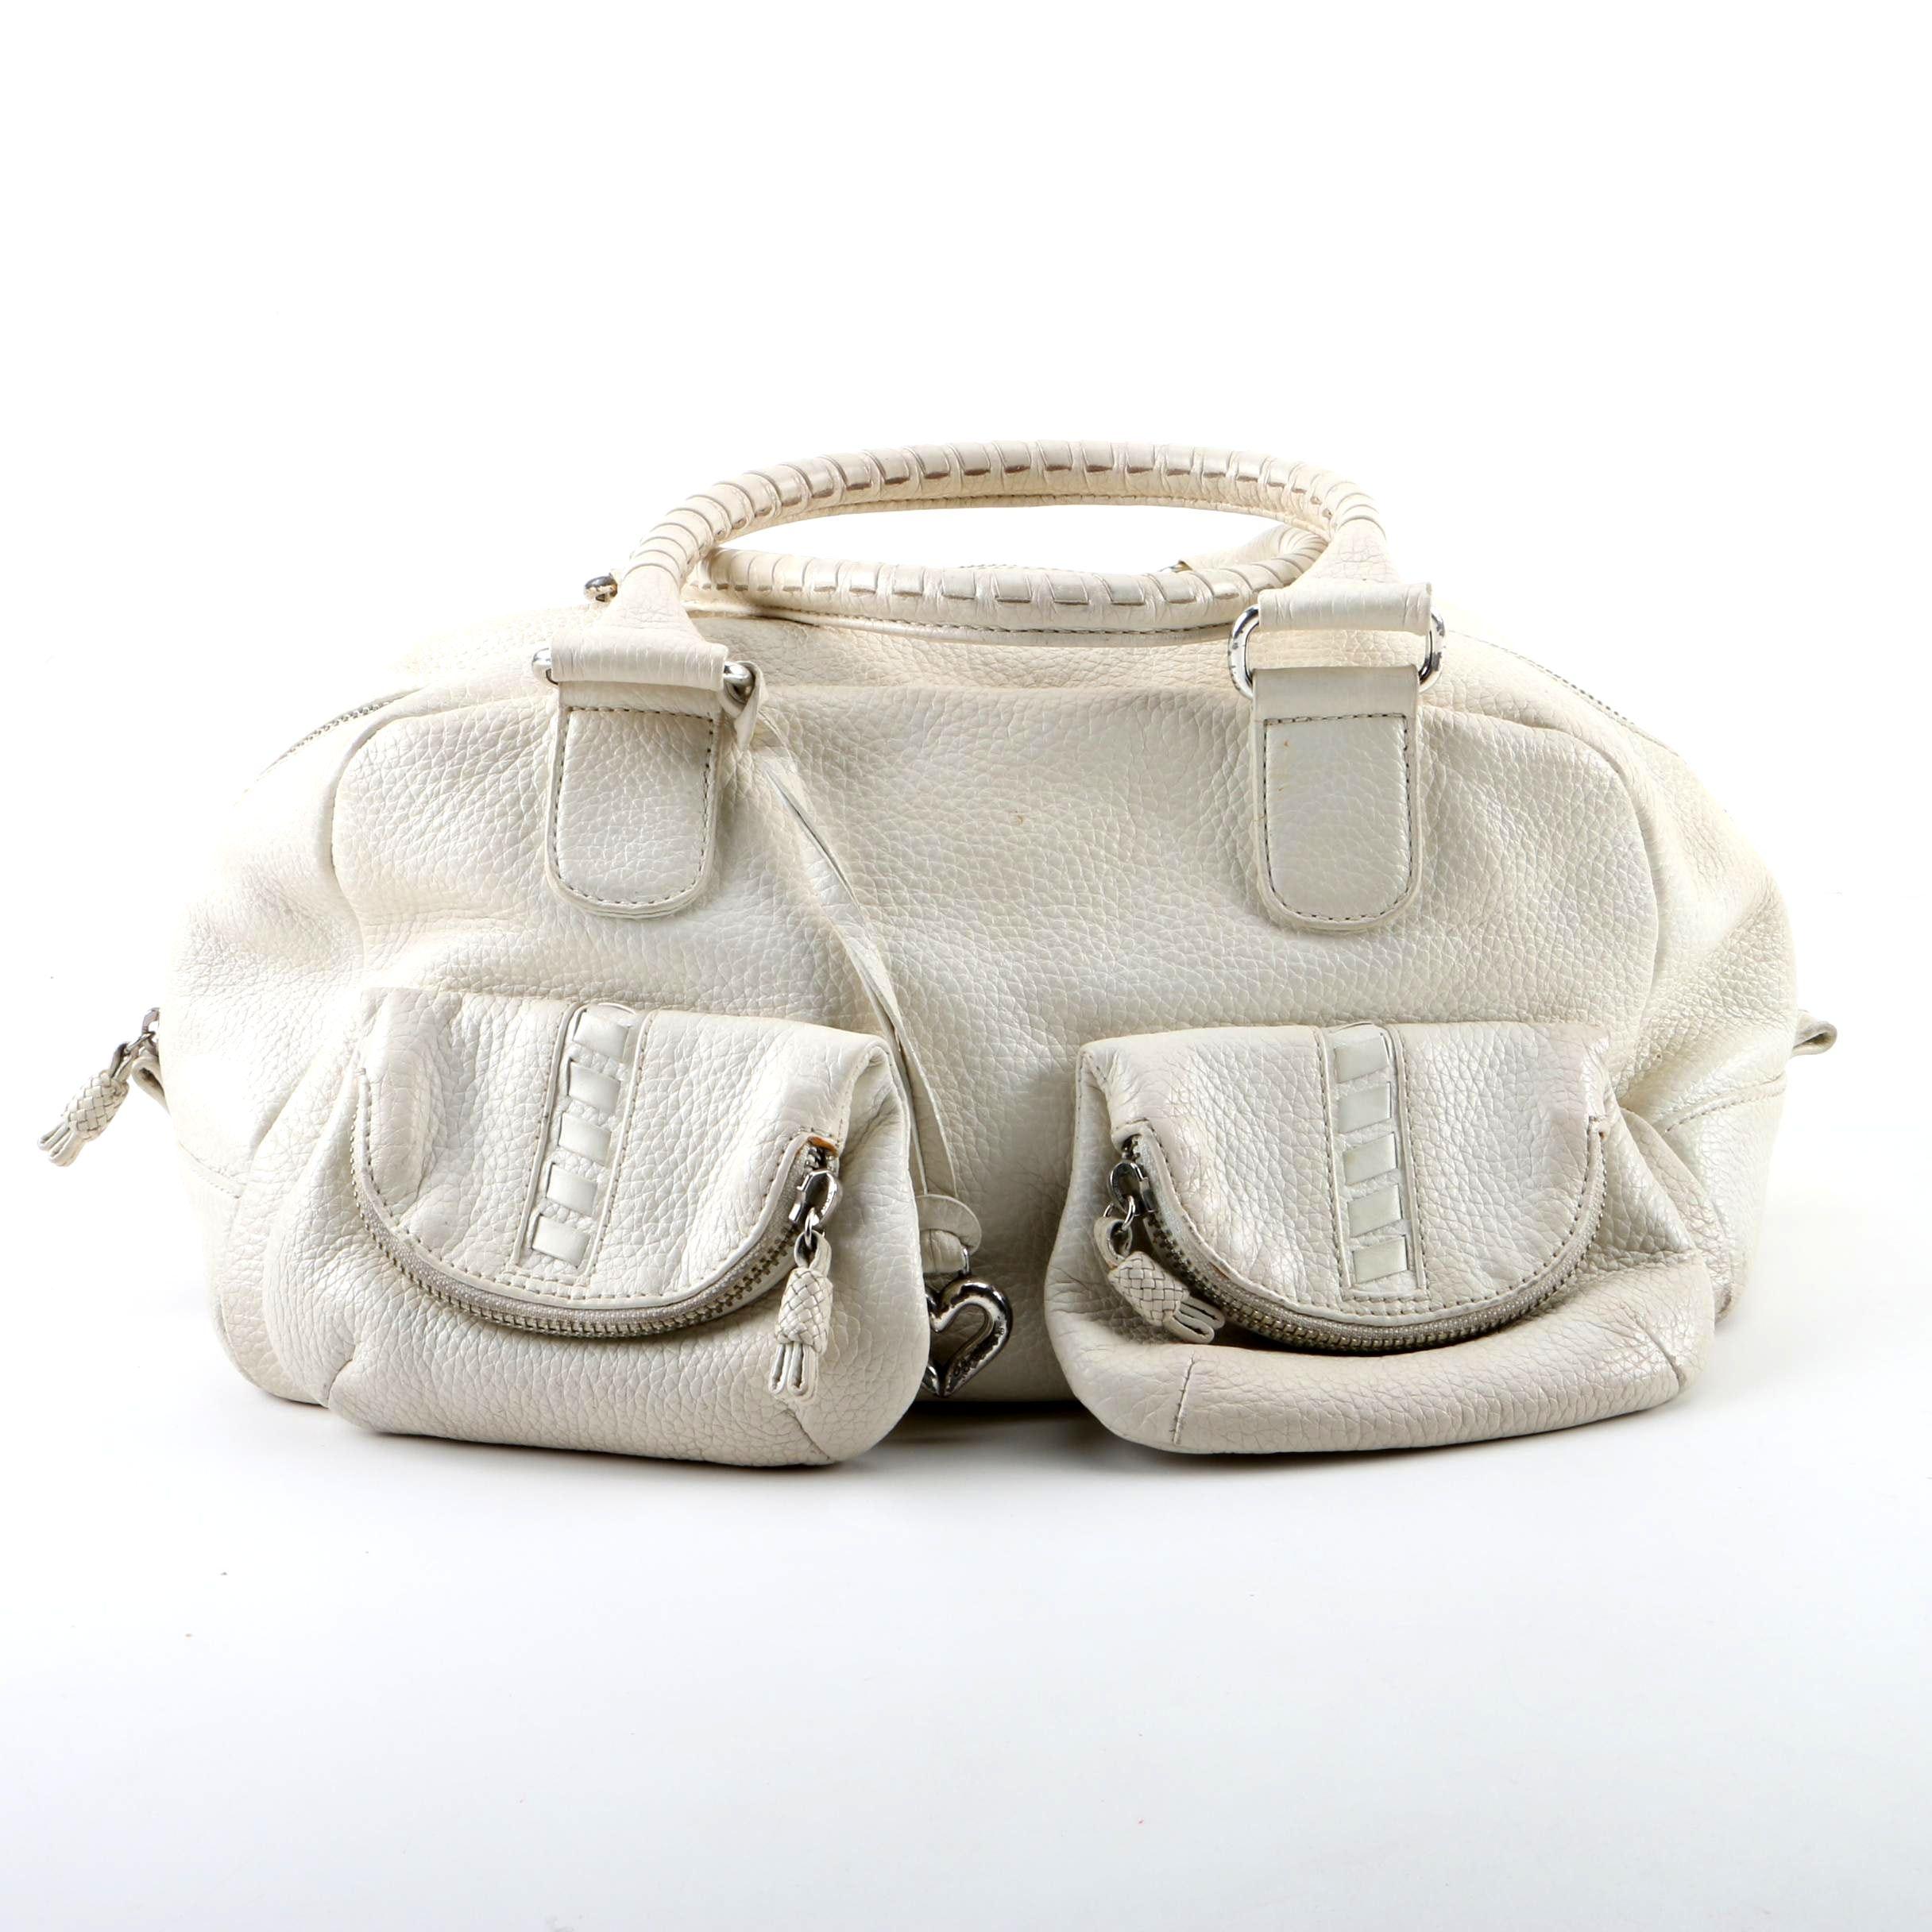 Brighton Off-White Pebbled Leather Satchel